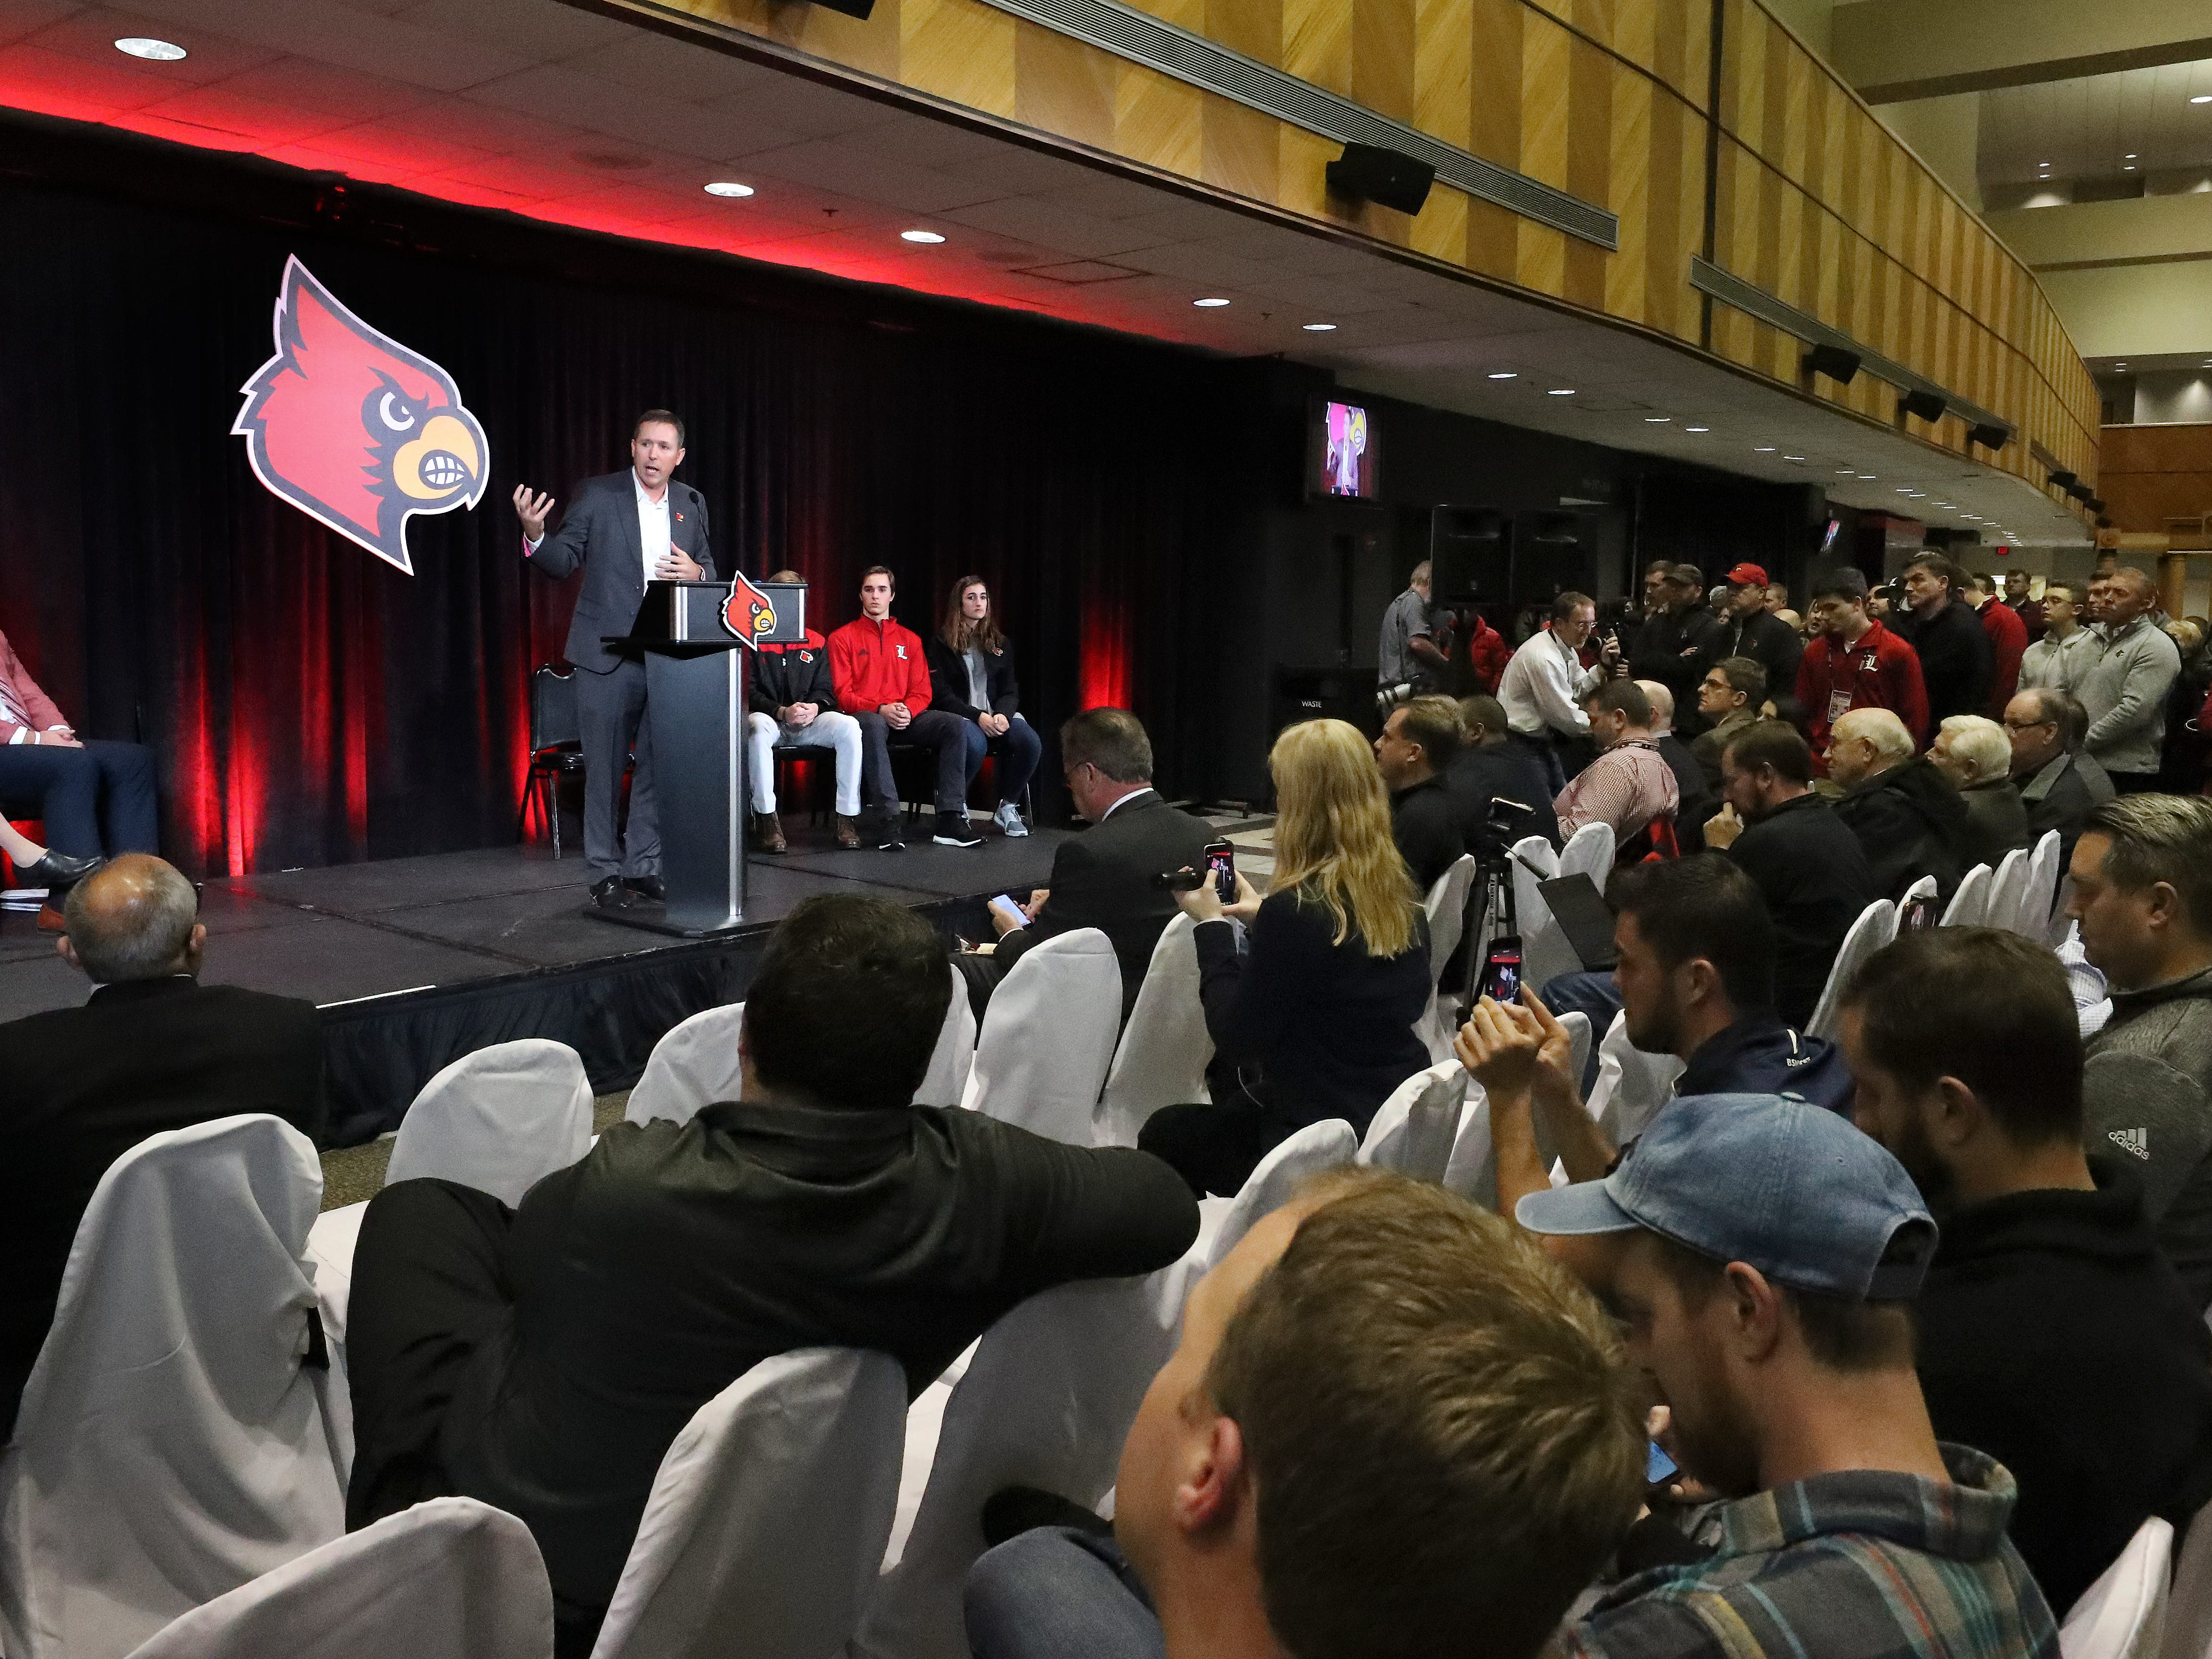 New U of L head football coach Scott Satterfield makes remarks during the announement at Cardinal Stadium.  Dec. 4, 2018